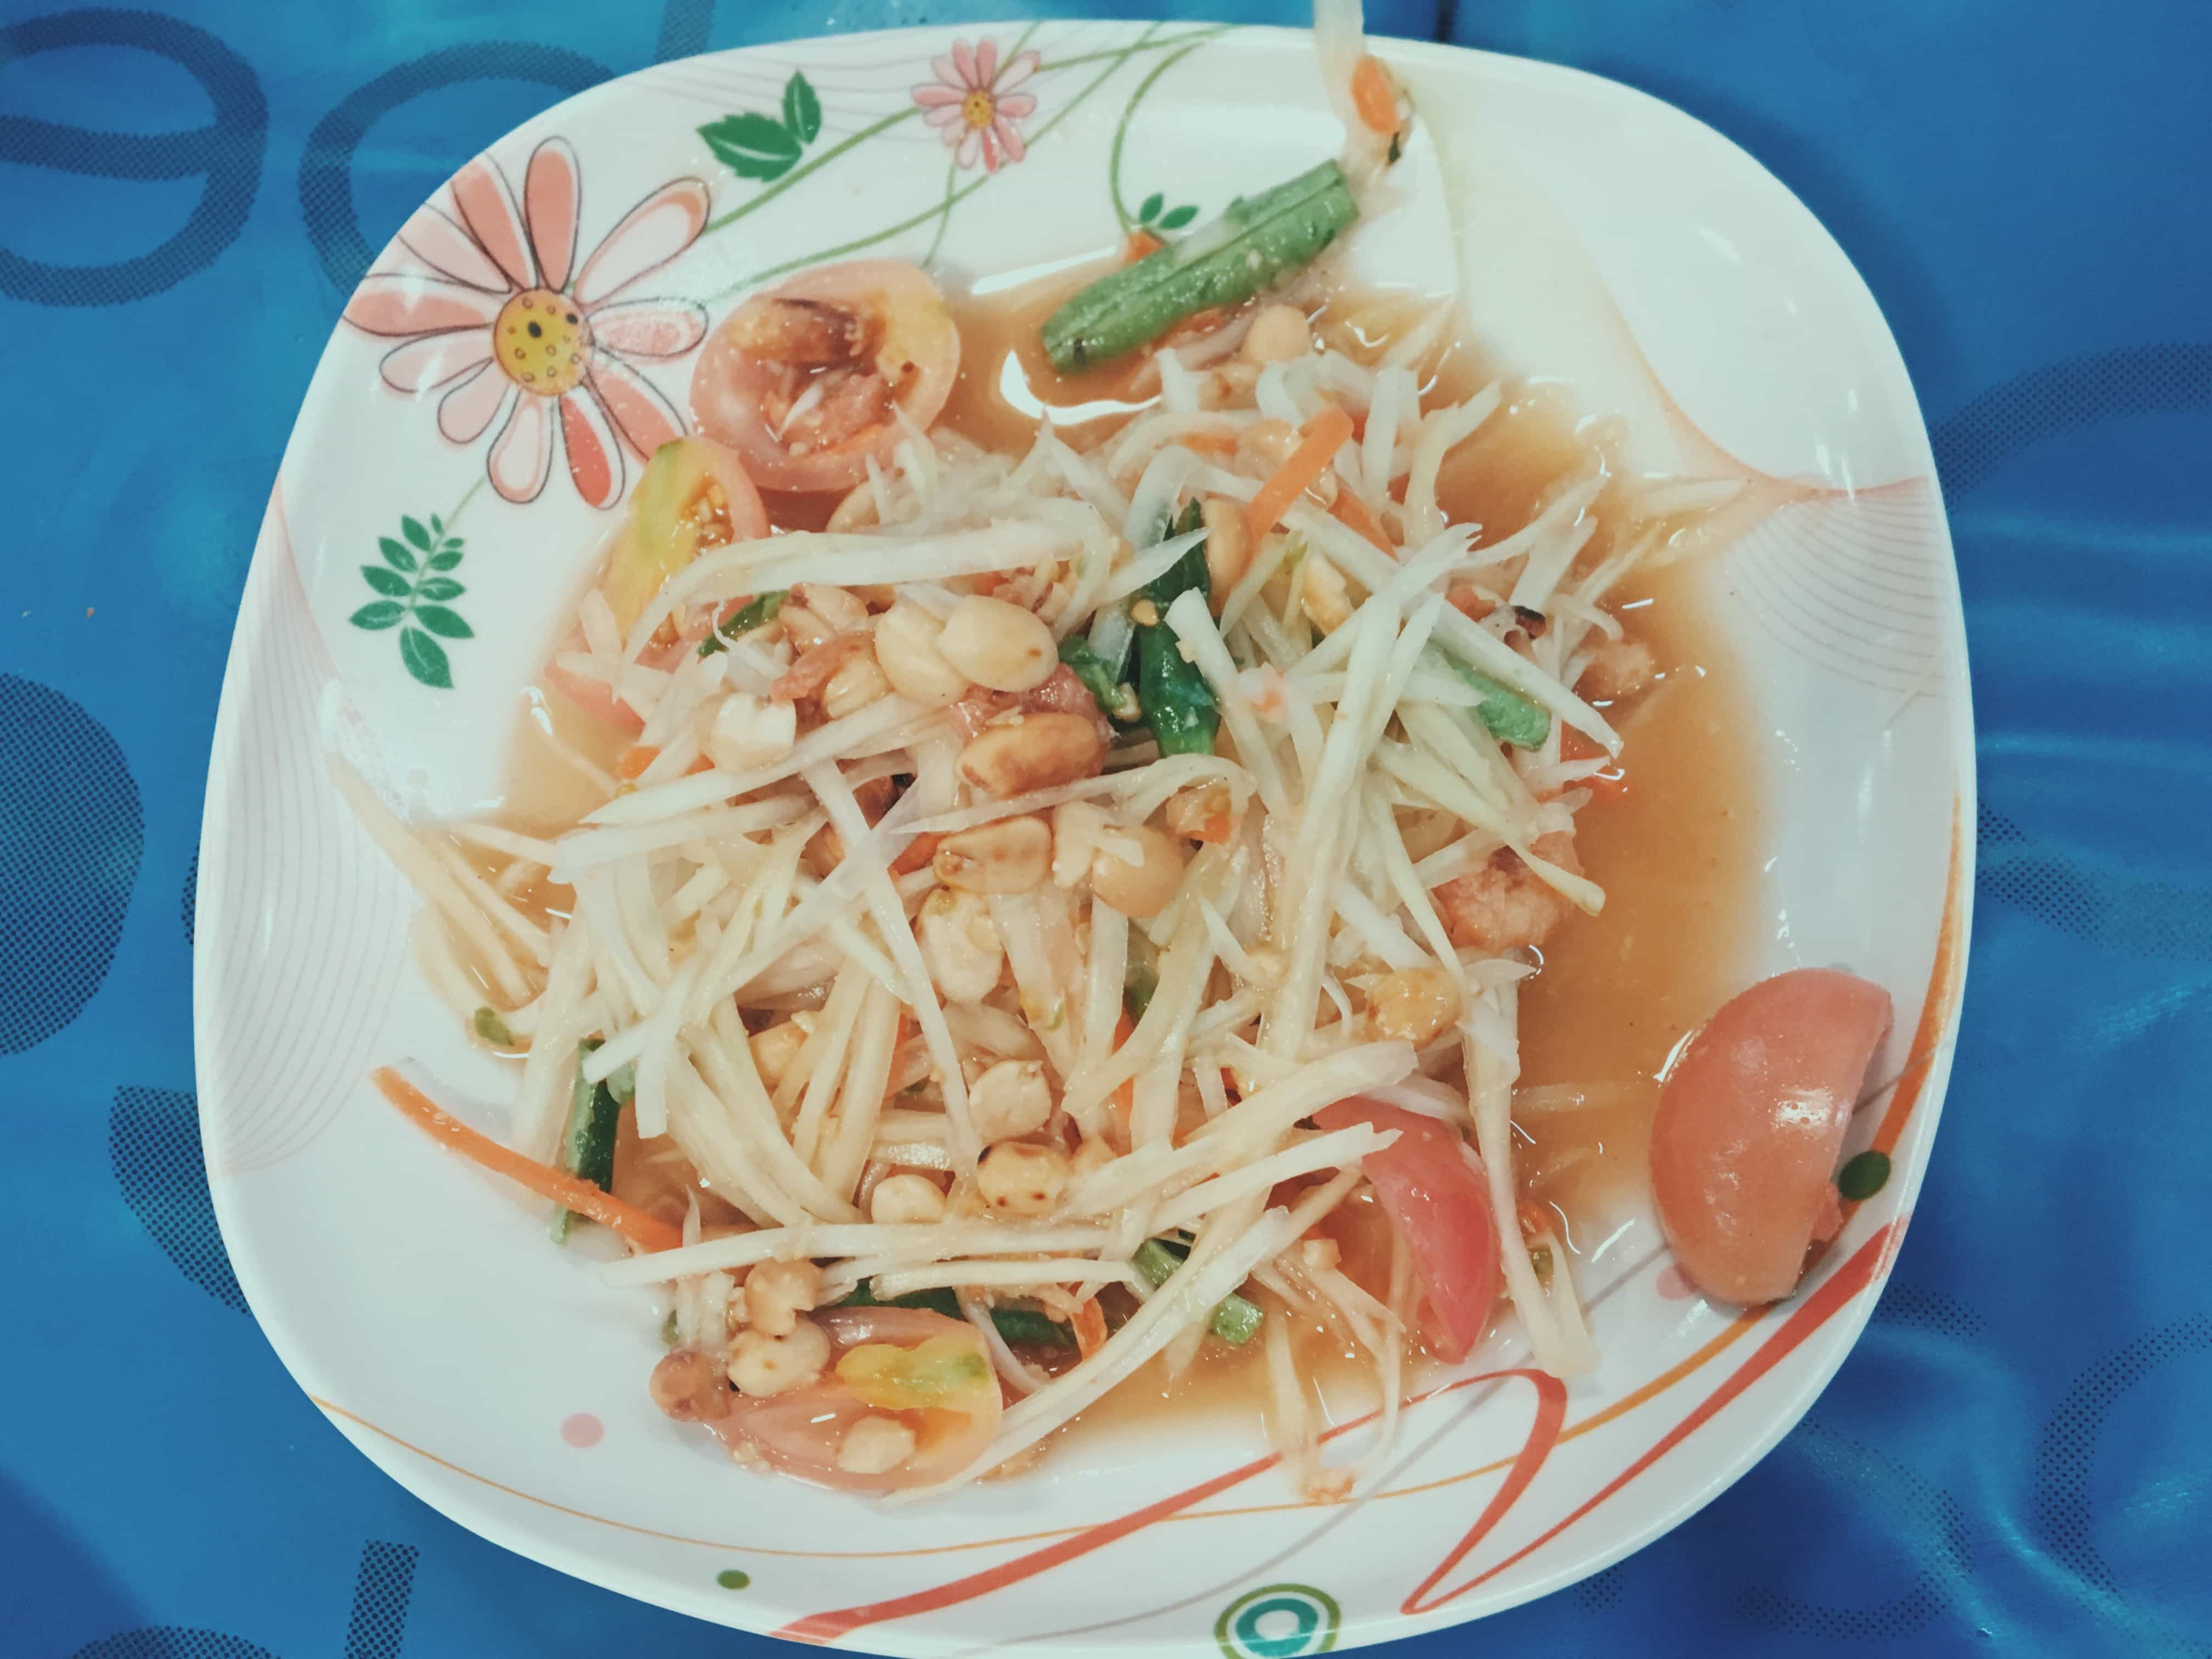 Thai food: Papaya salad